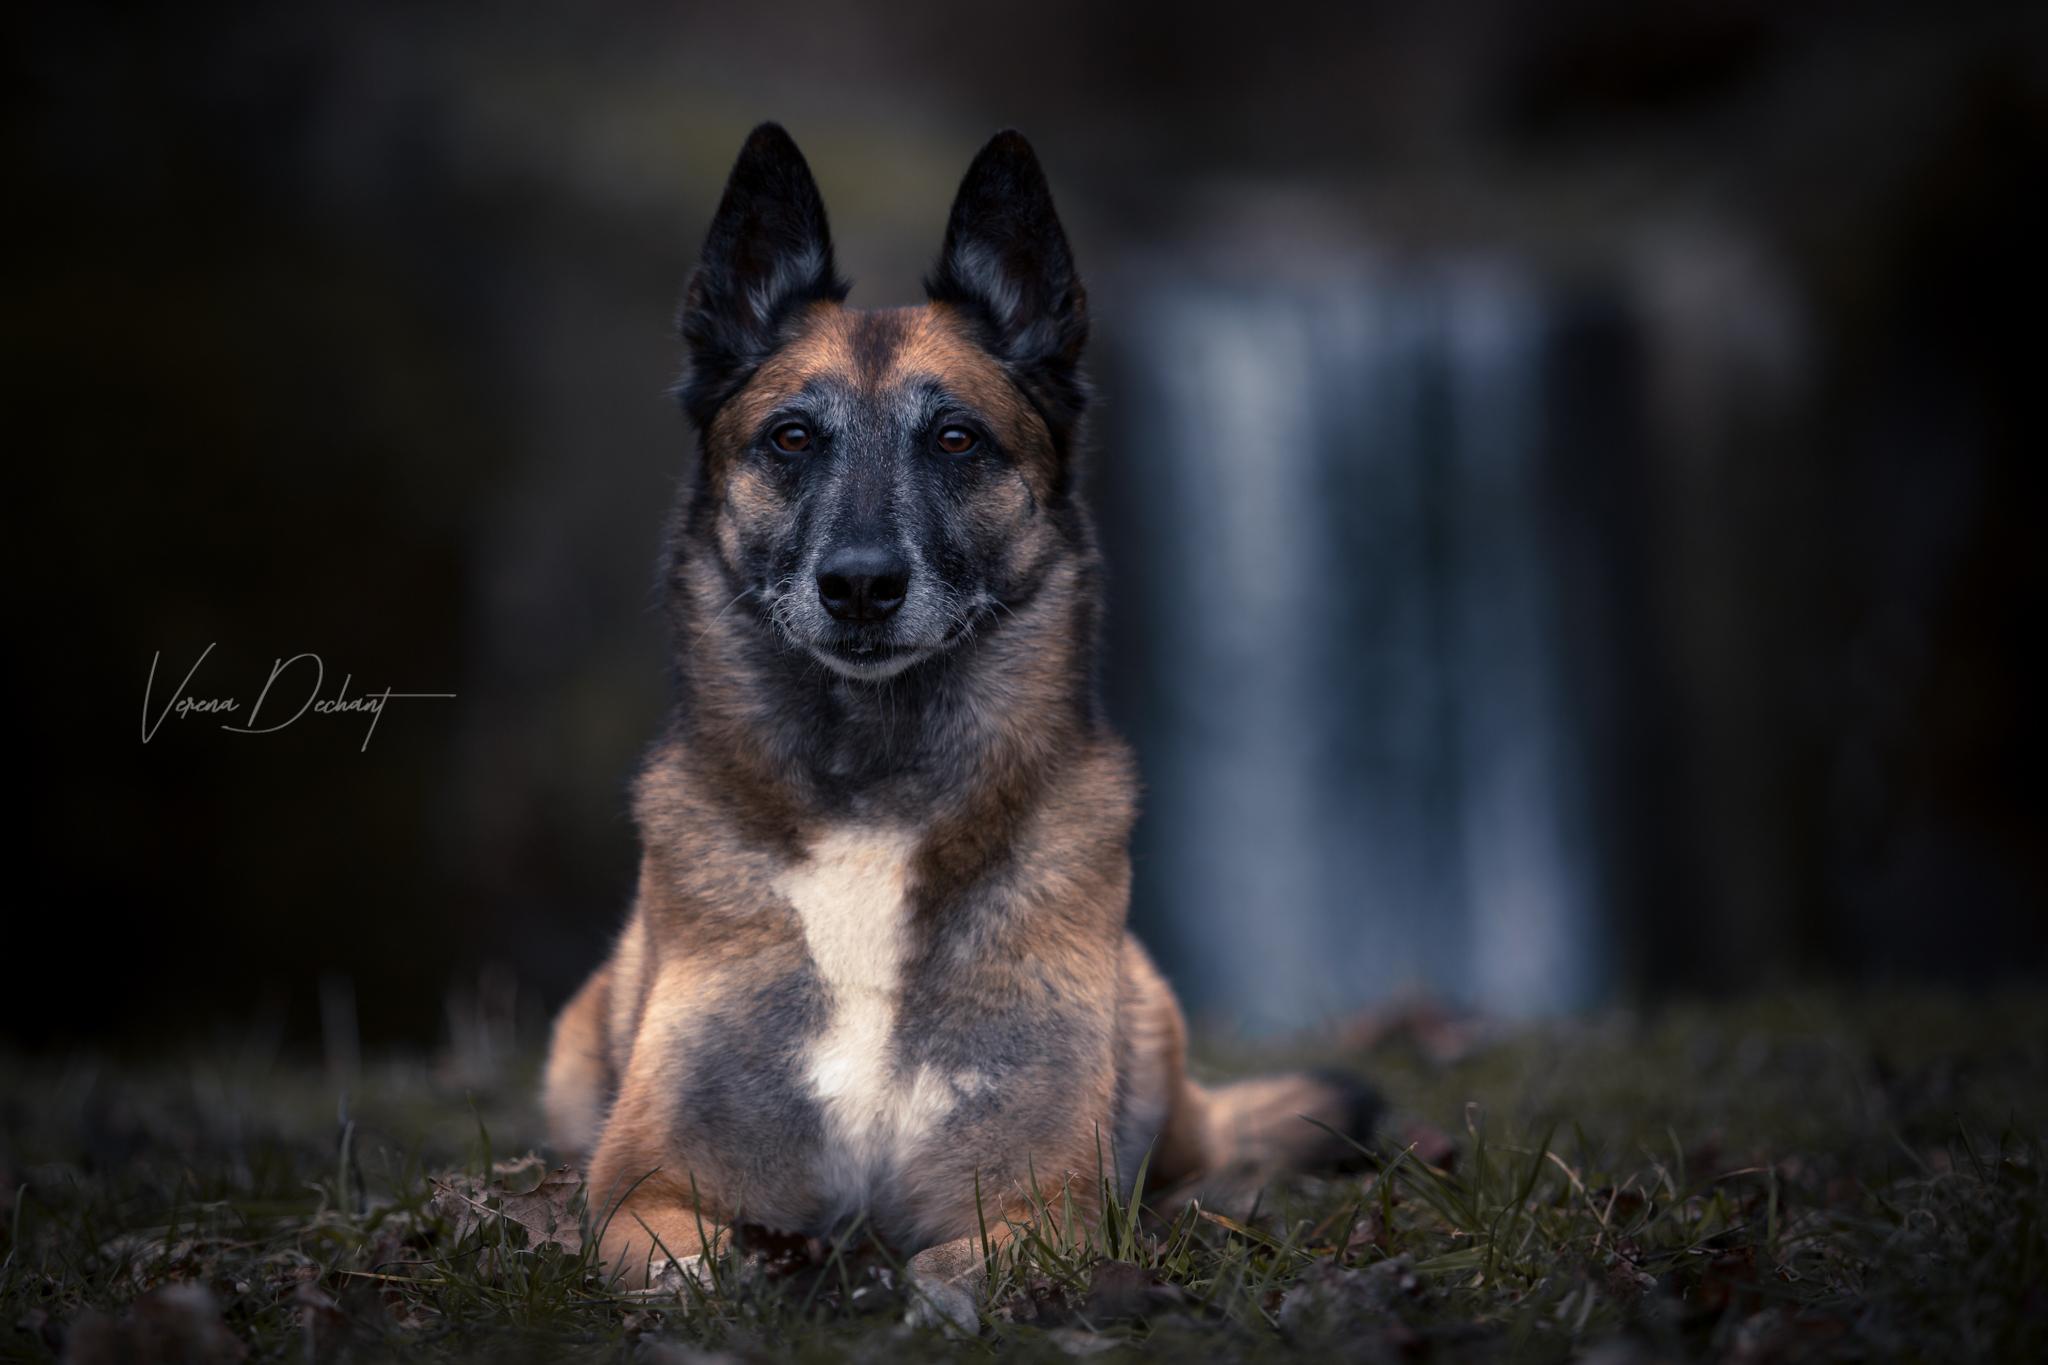 Verena Dechant Hundefotografie Niederbayern Bayern